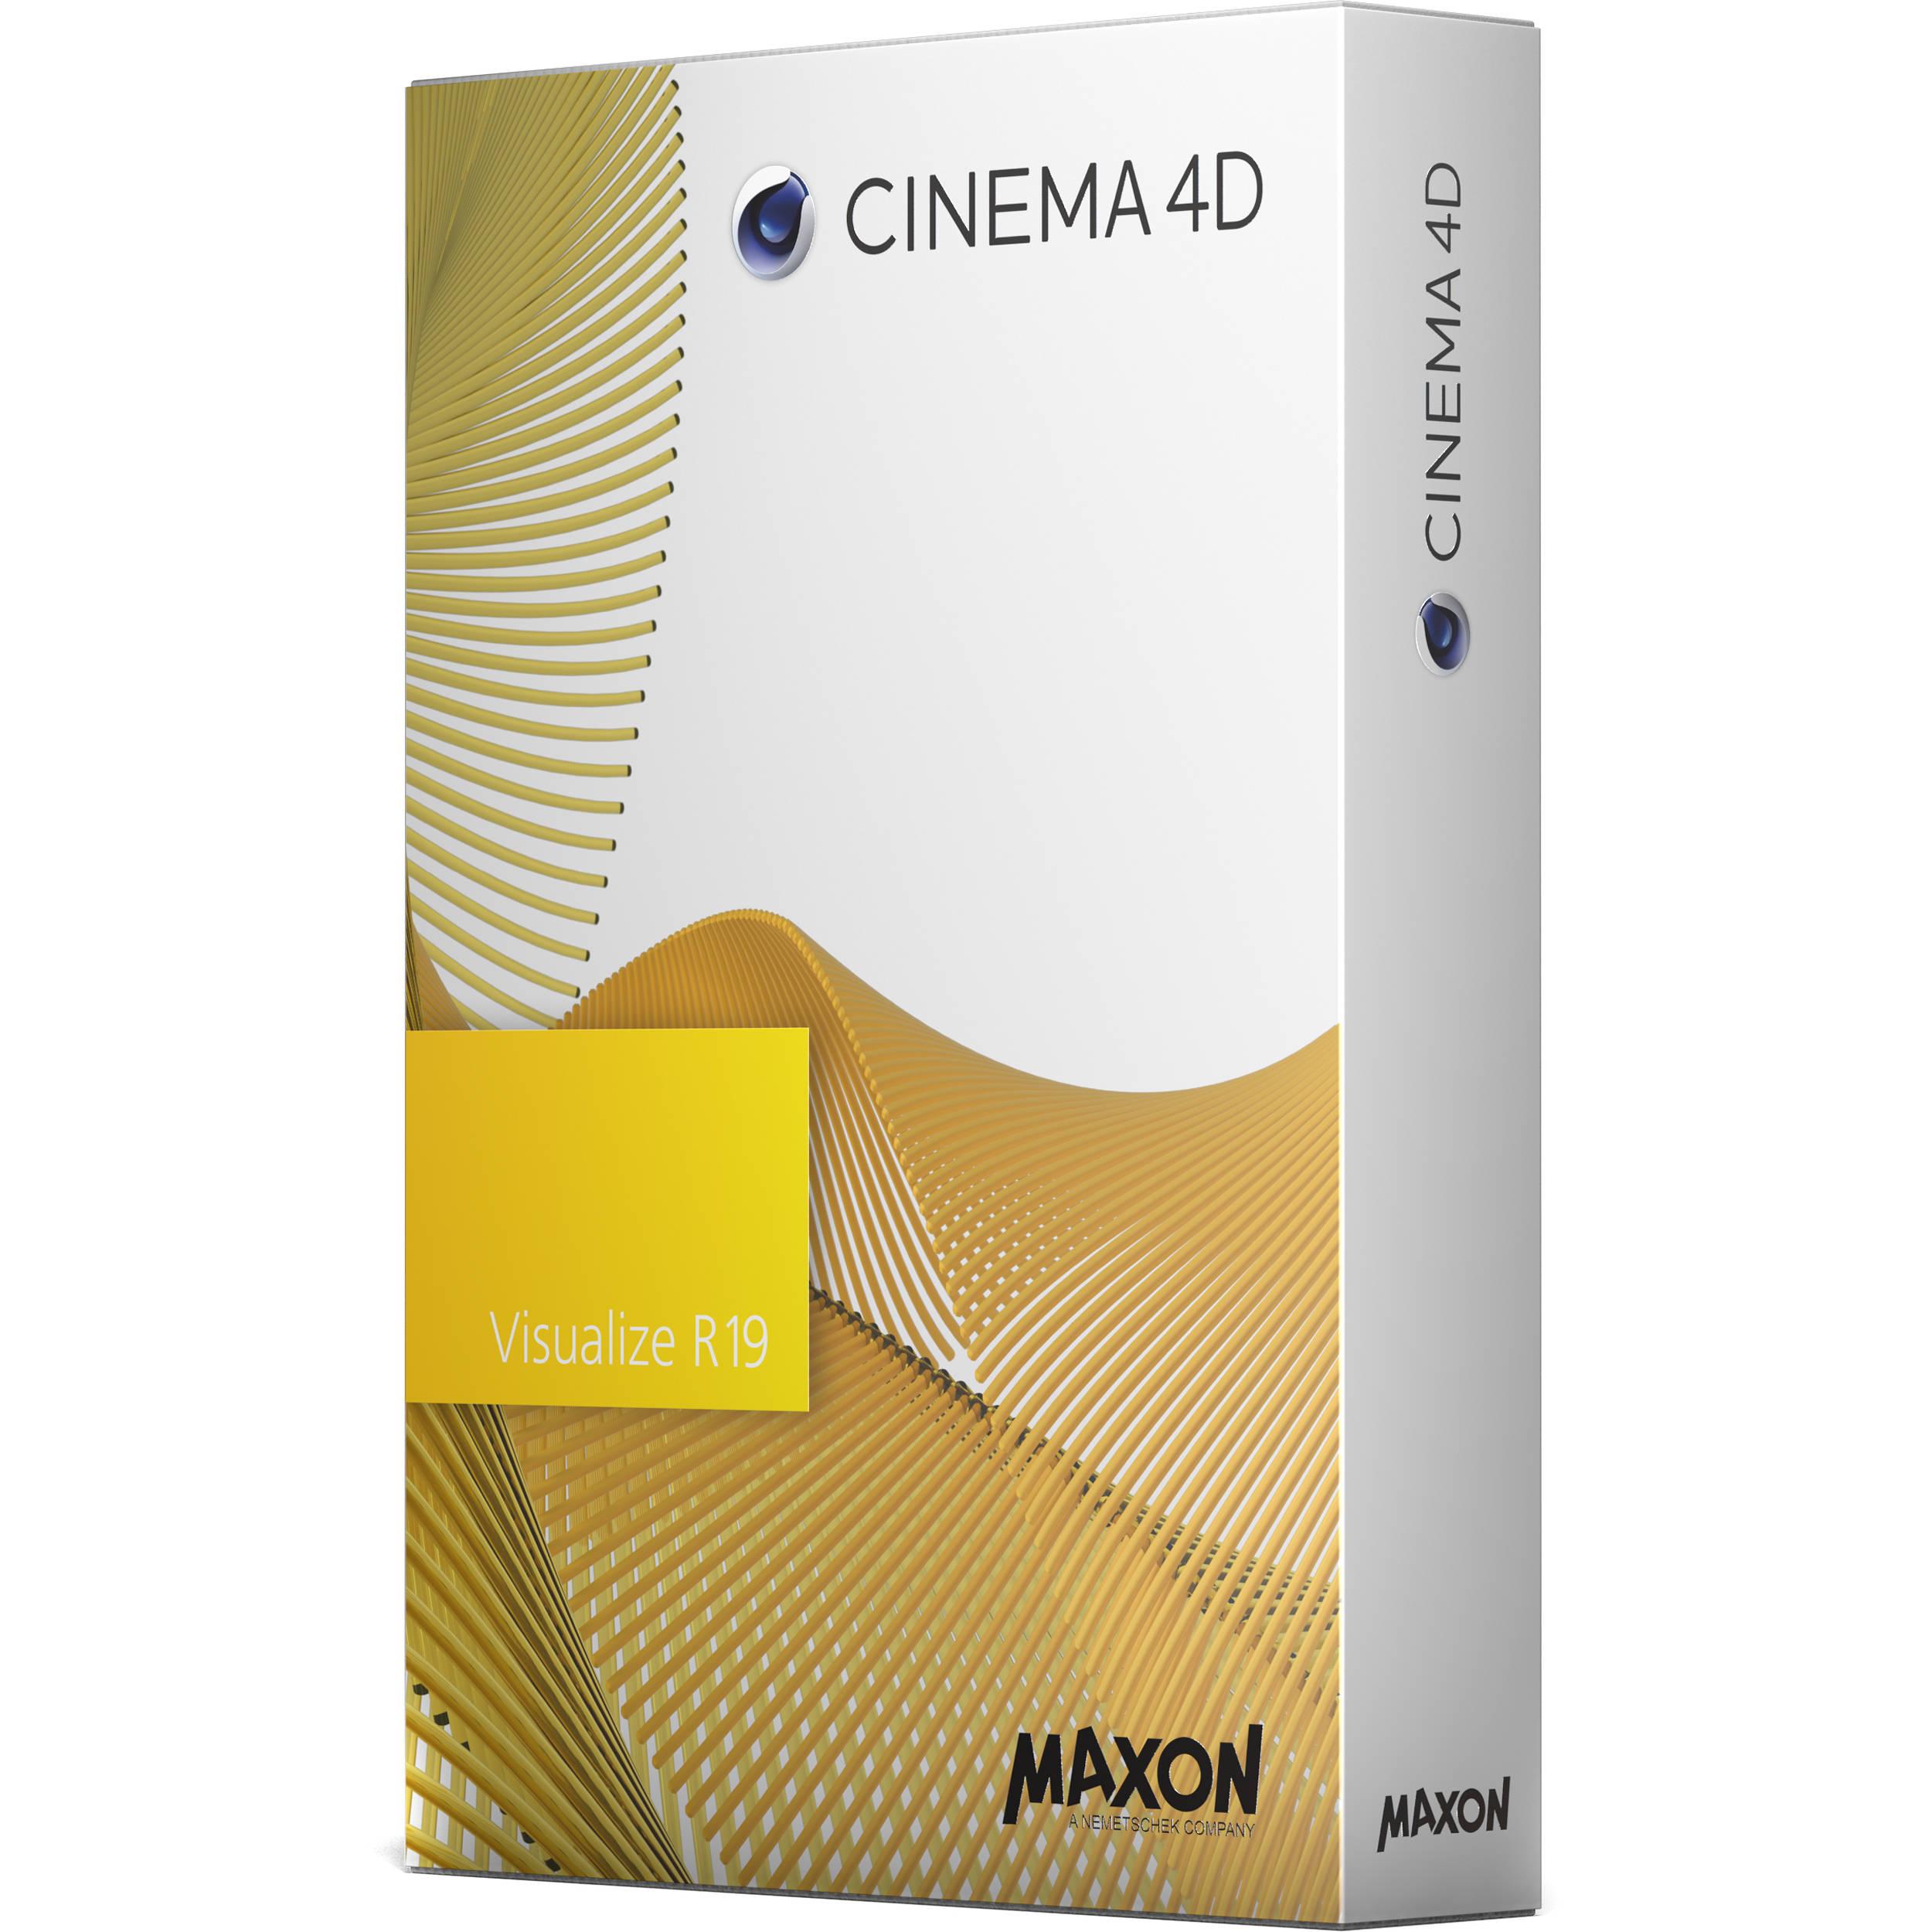 Maxon Cinema 4D Visualize R19 (Download) C4DVIZ-N-19 B&H Photo